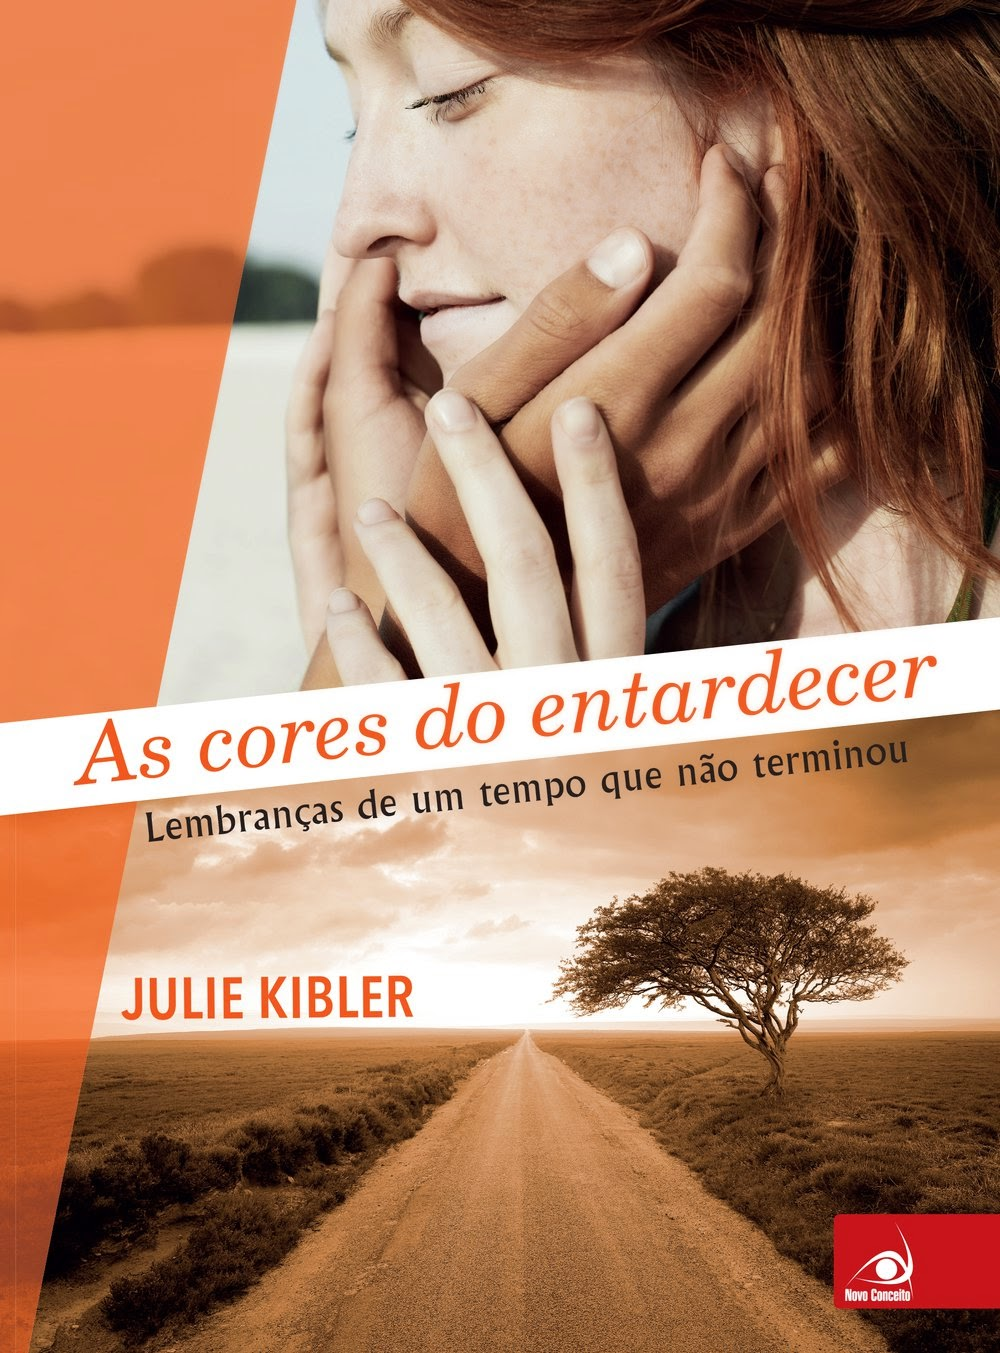 http://www.skoob.com.br/livro/427010ED483626